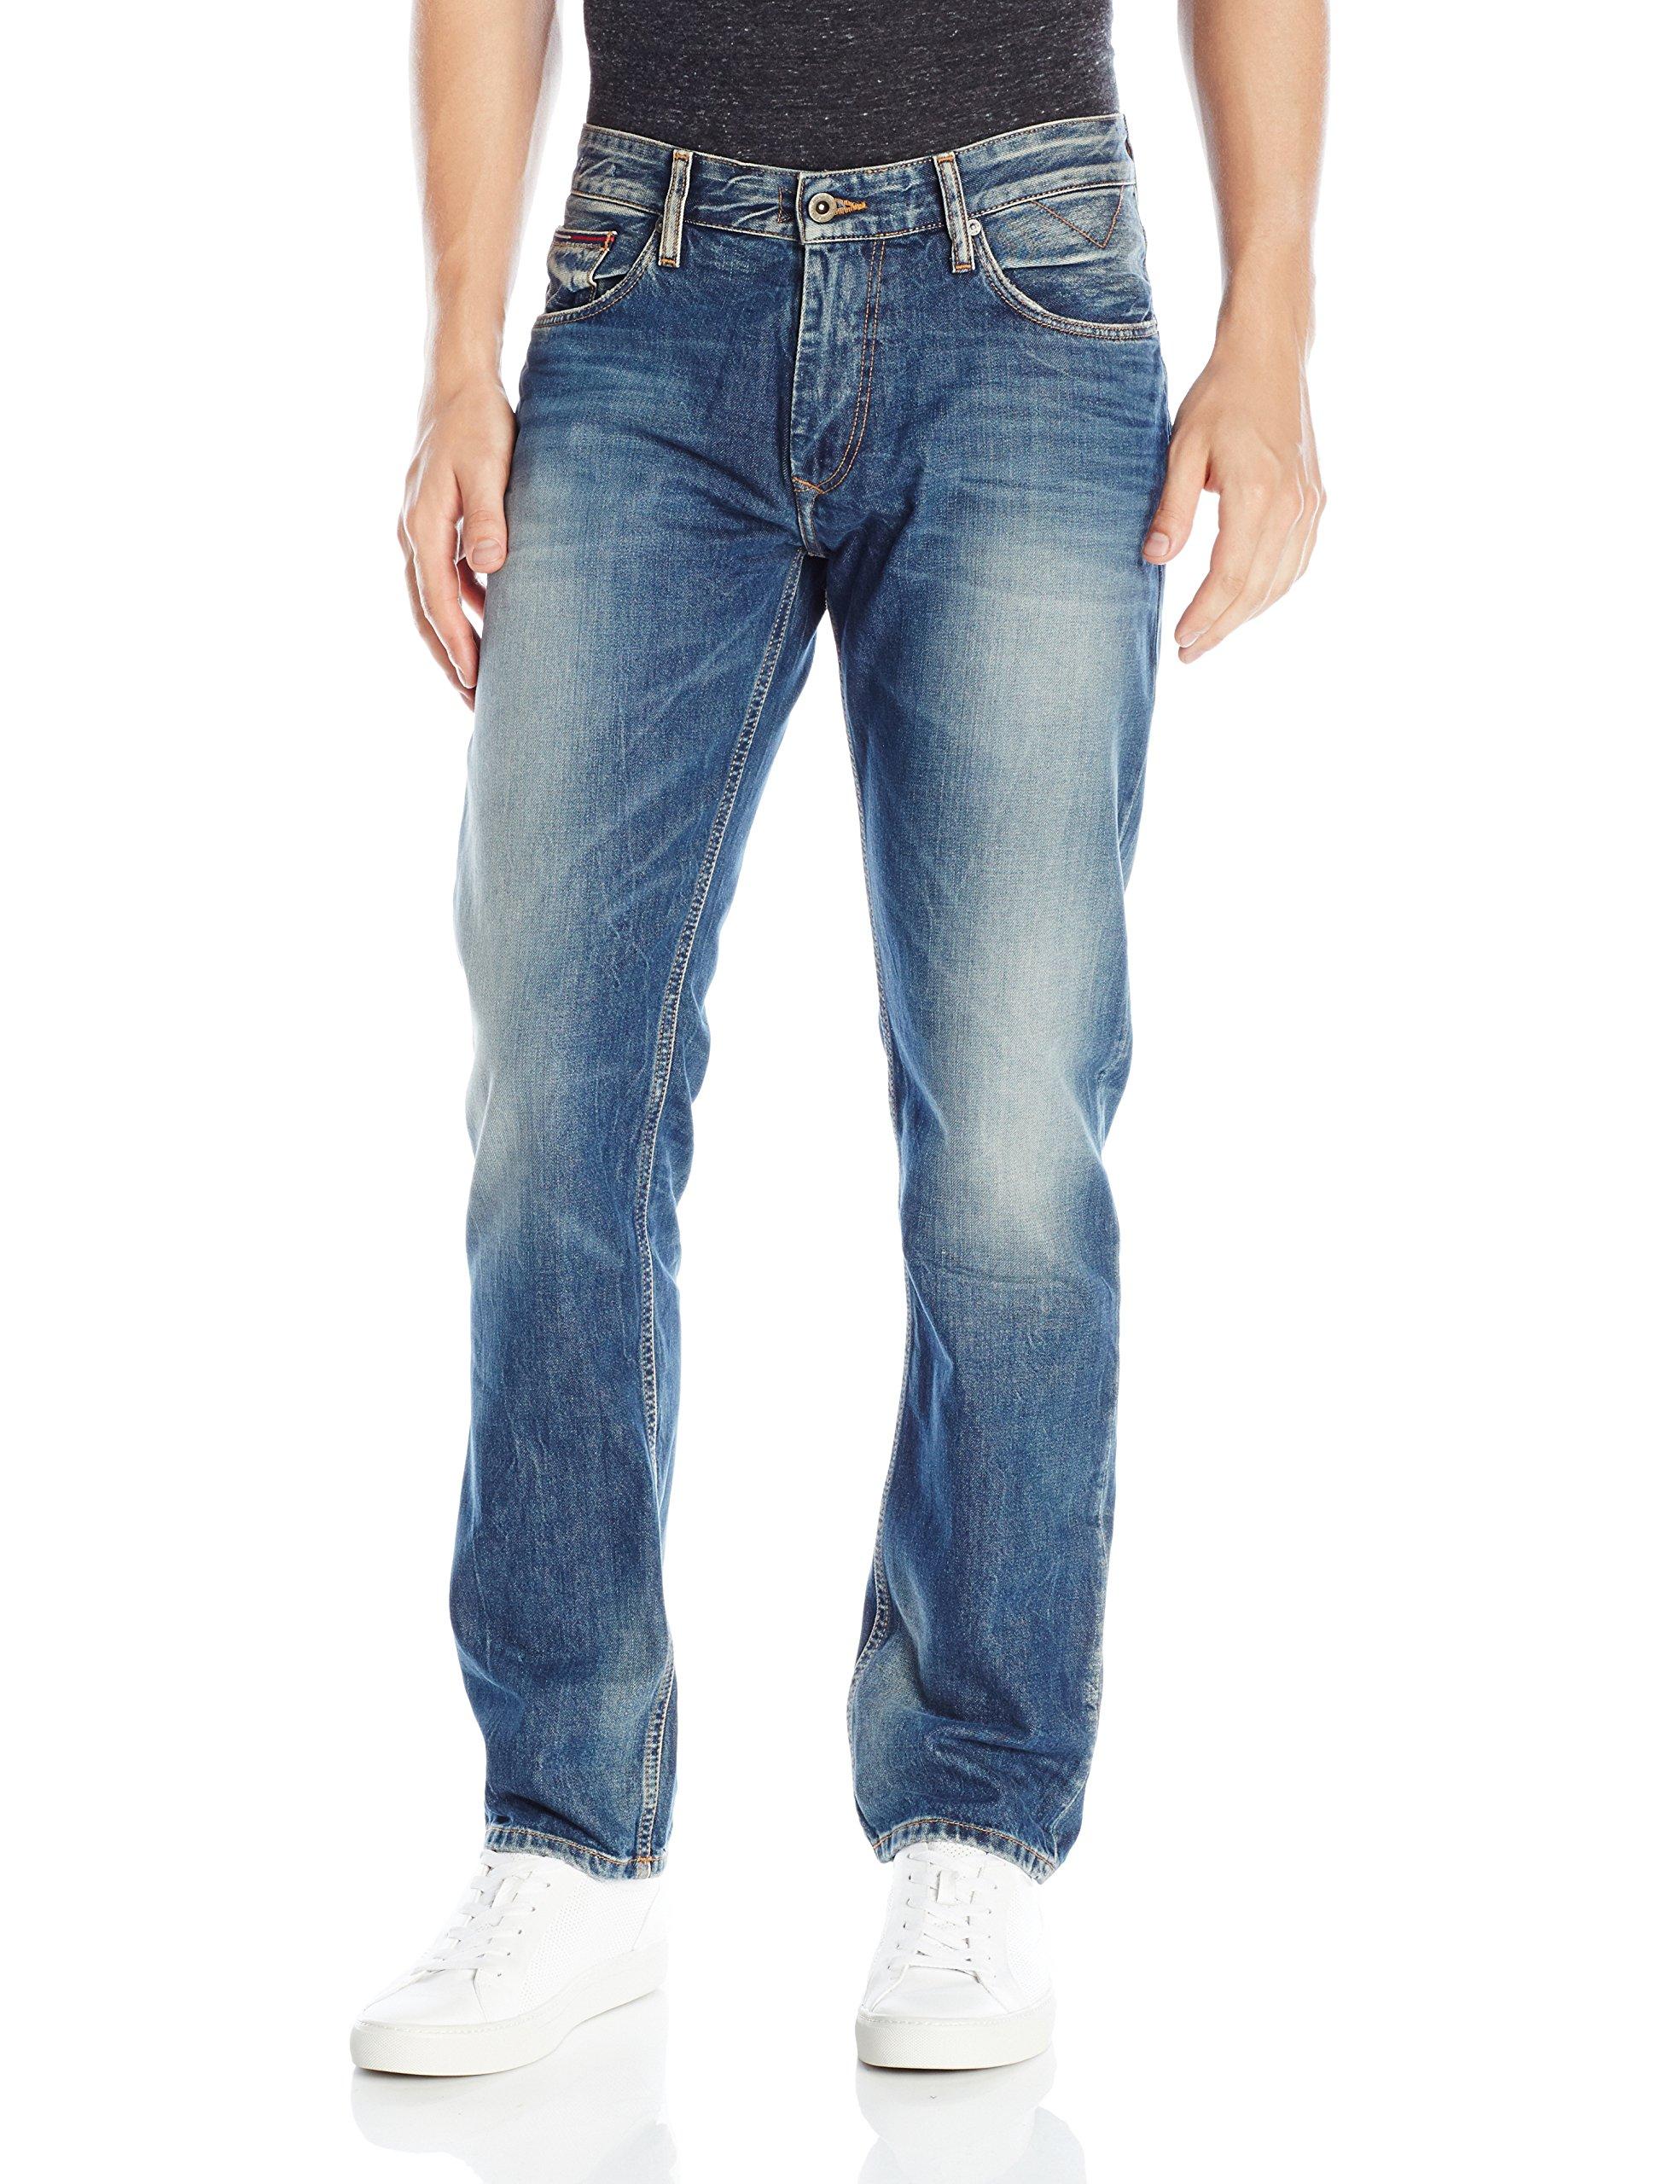 Tommy Hilfiger Denim Men's Jeans Original Ryan Straight Fit Jean, Penrose Blue, 38x30